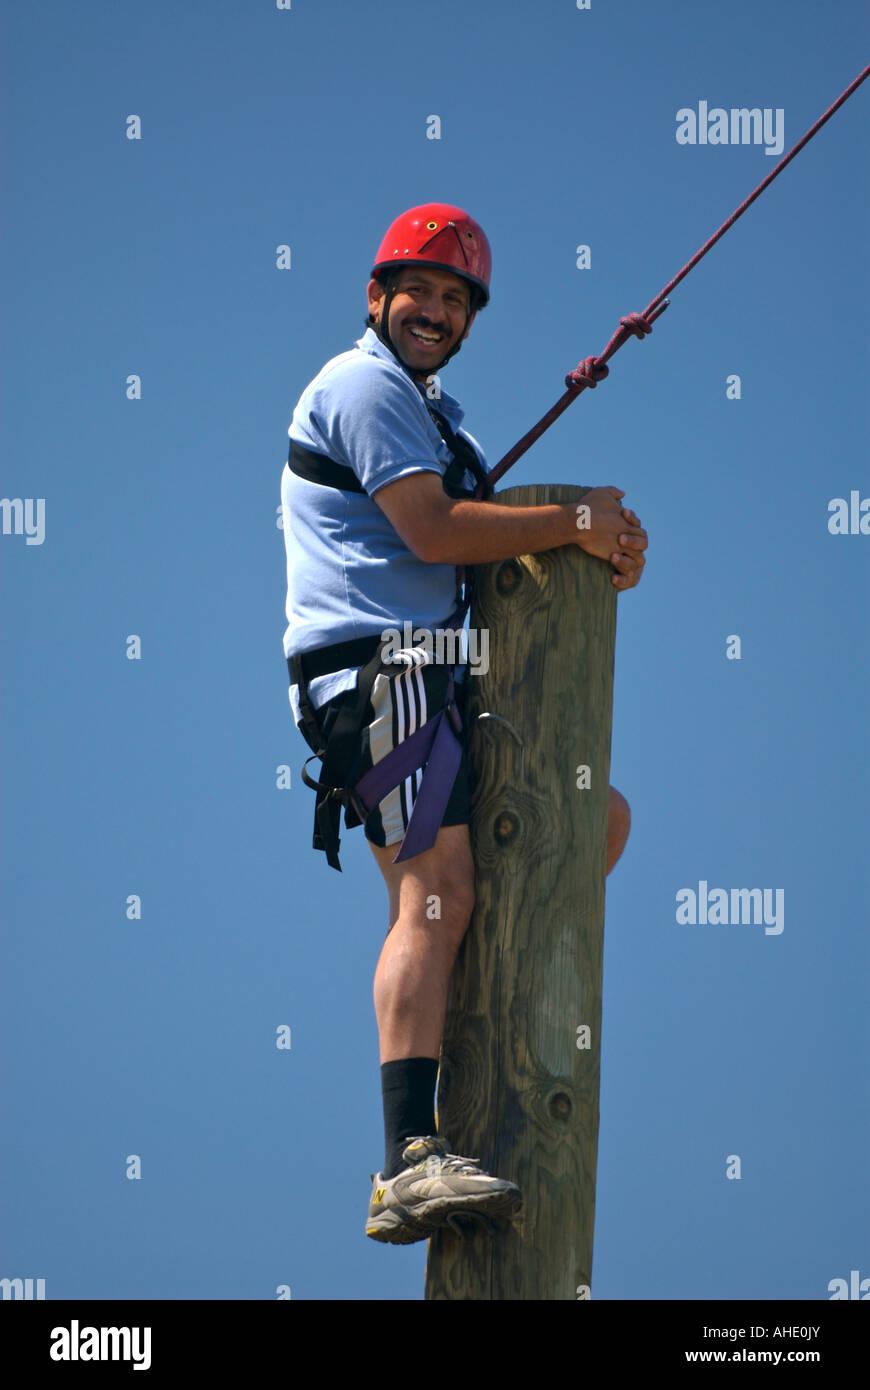 A smiling Pakistani man hugs a telephone pole as he climbs to the top - Stock Image